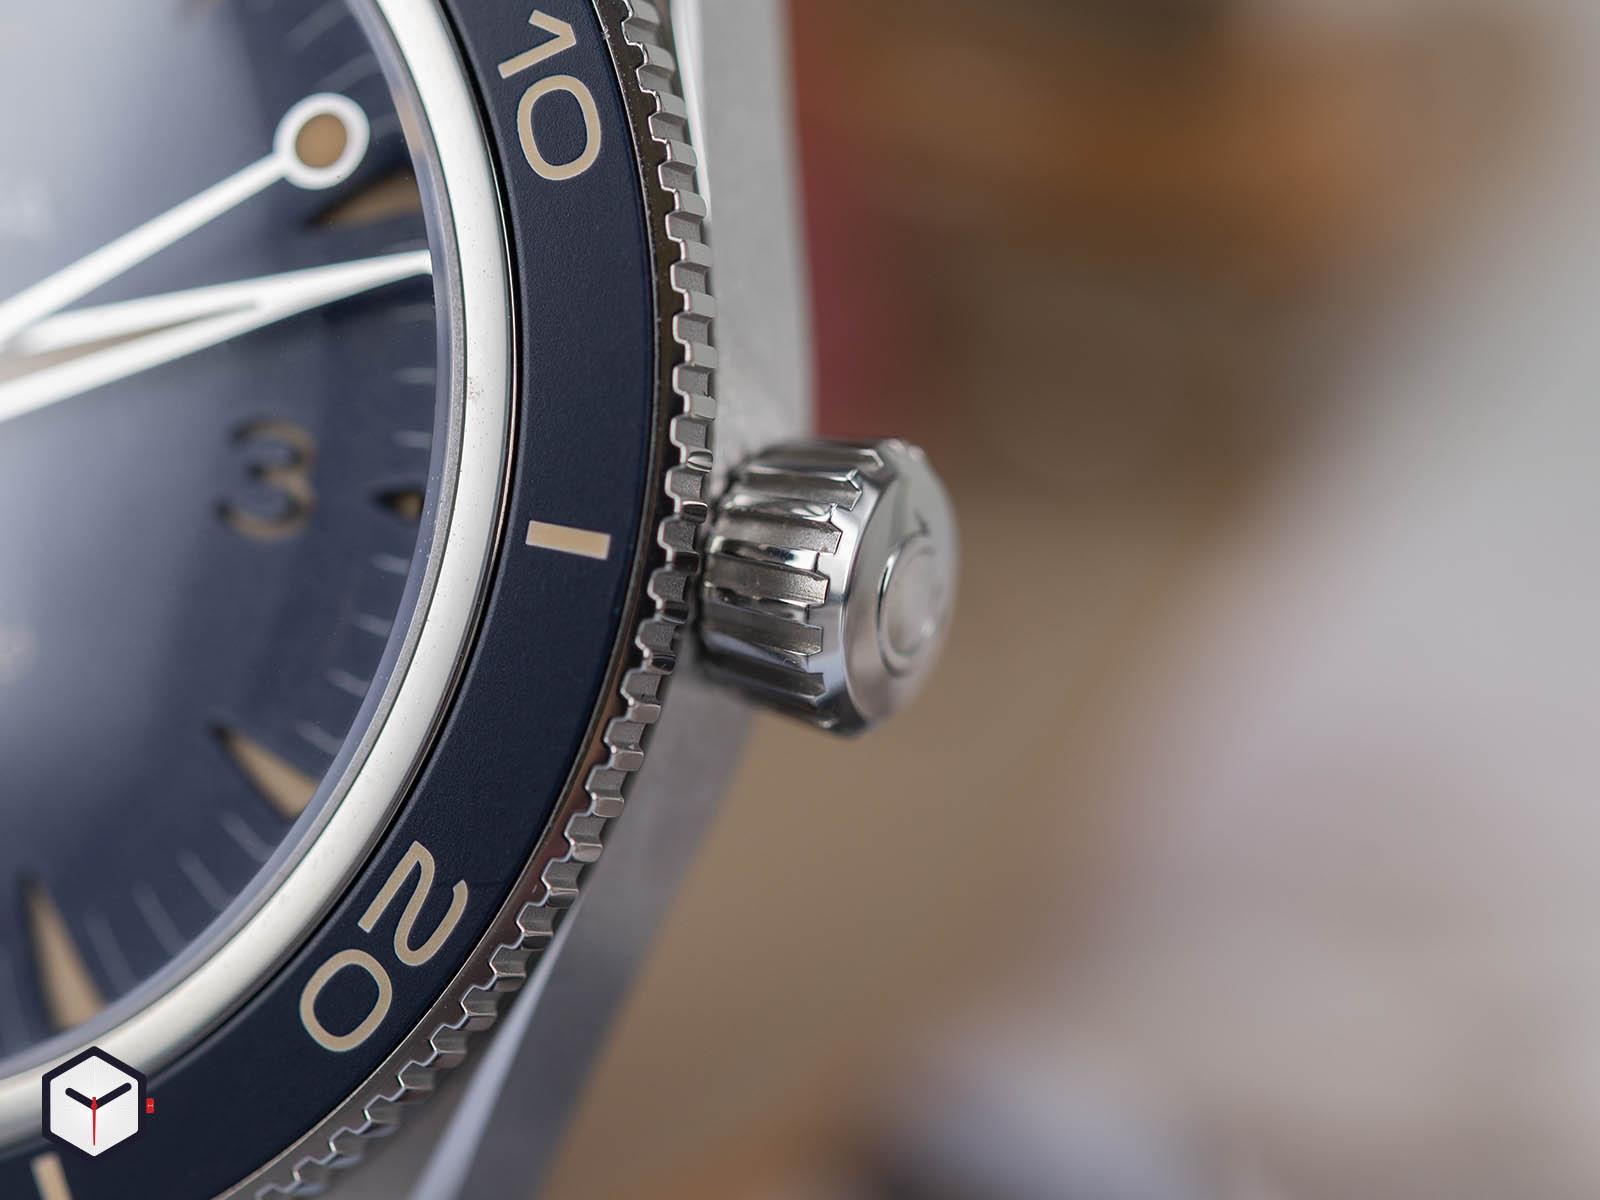 omega-seamaster-300-co-axial-master-chronometer-41mm-5.jpg